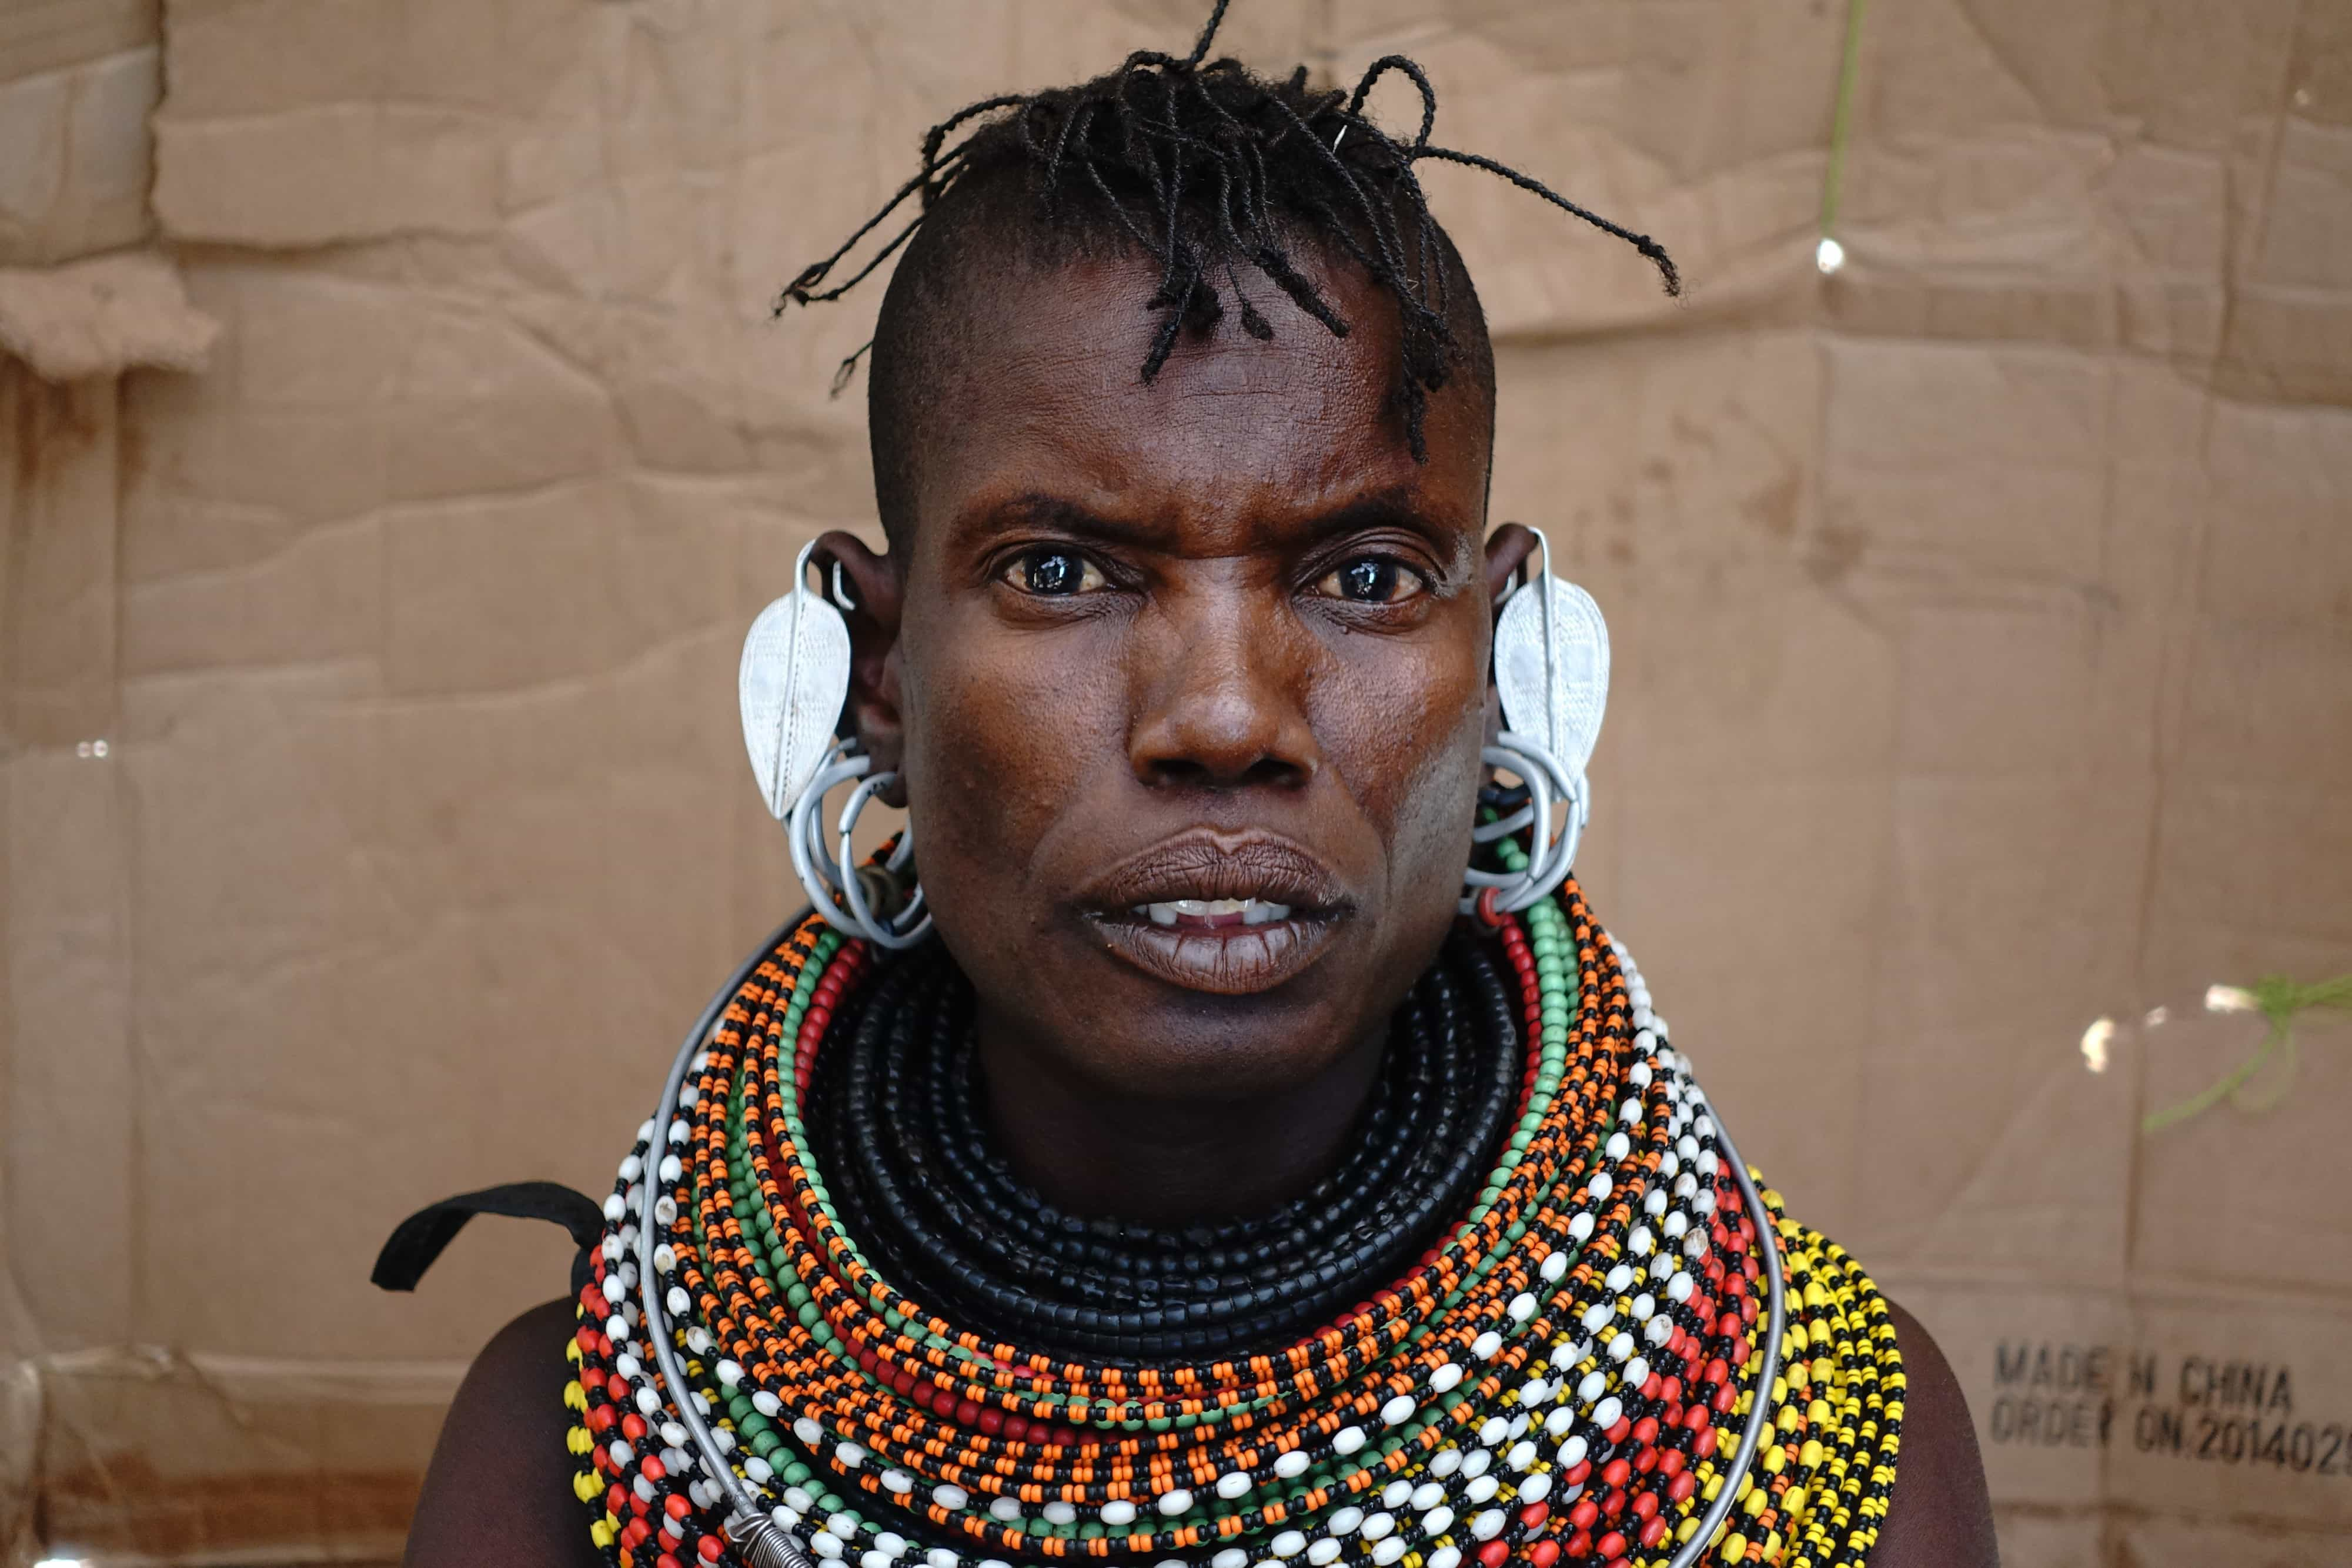 Nongala. Turkana-kvinde i Sarima. Foto: Shafiur Rahman, Danwatch.